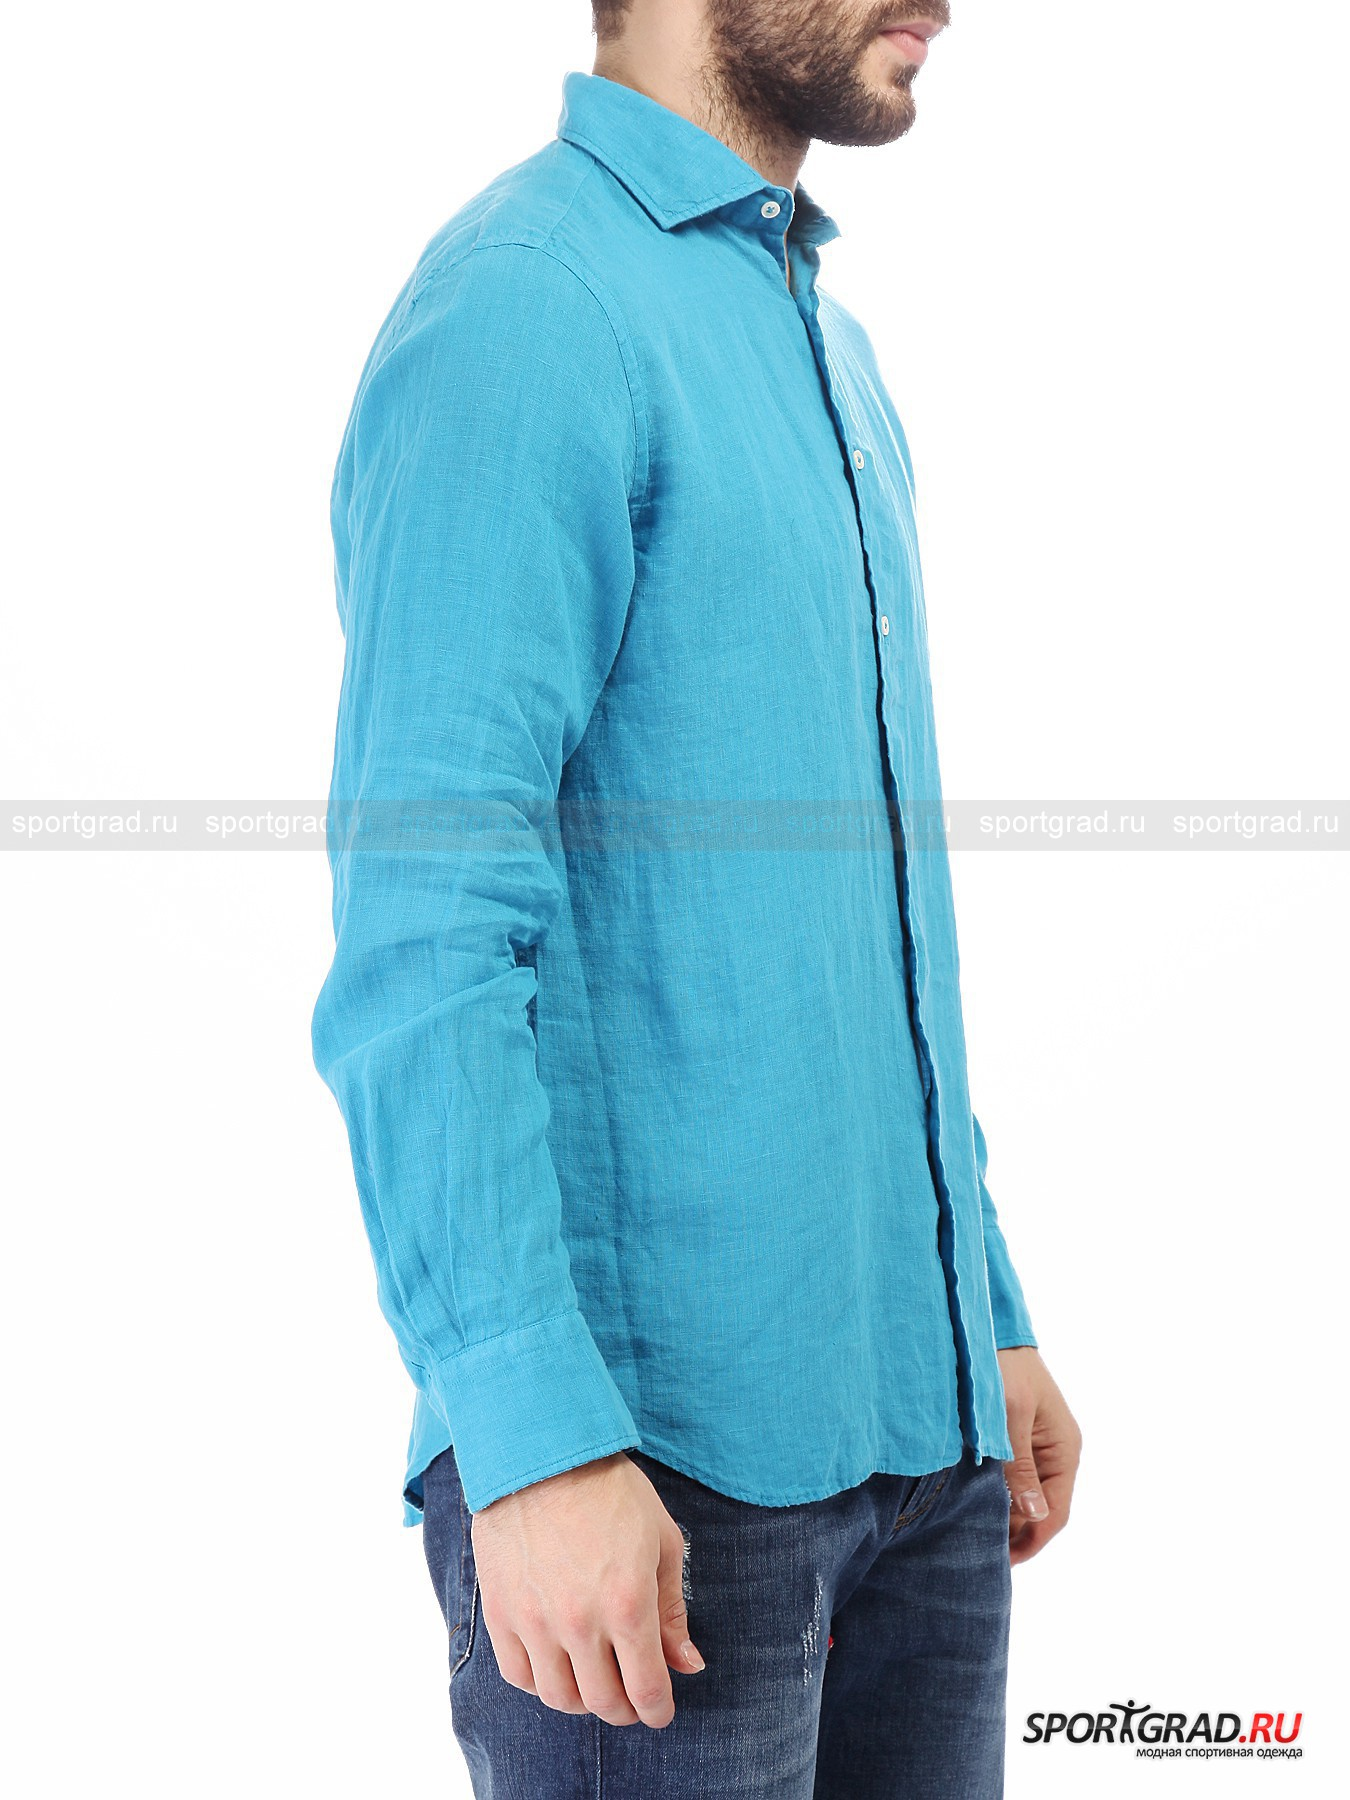 Рубашка мужская MC2 SAINT BARTH от Спортград